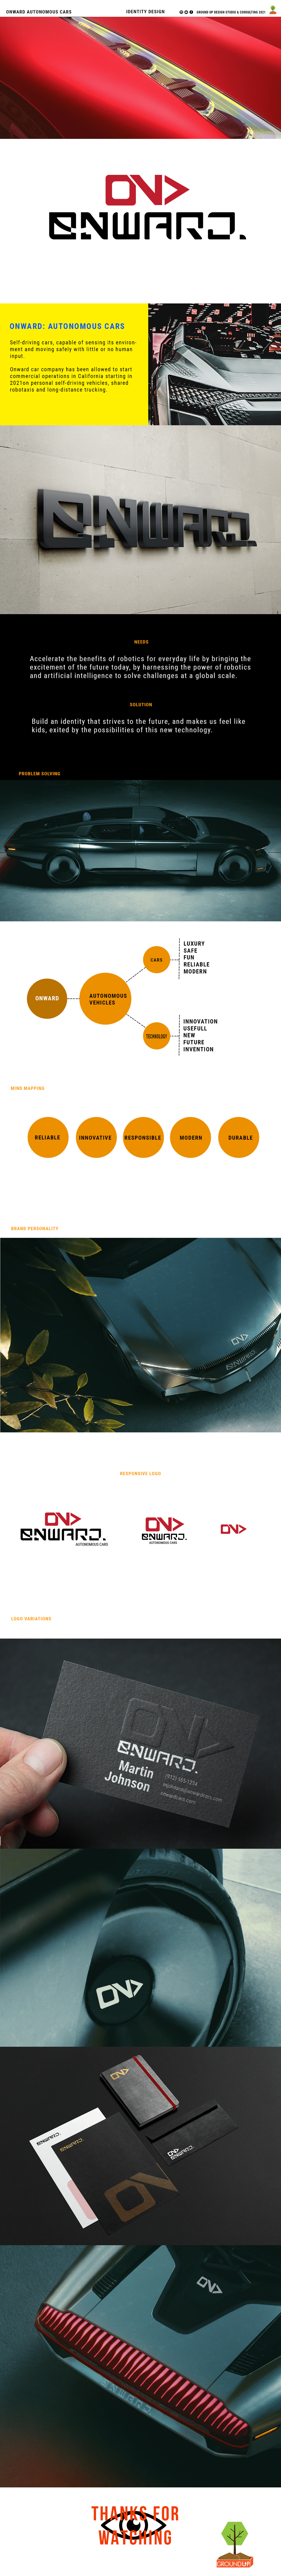 ai Autonomous car Cars identity logo Vehicle